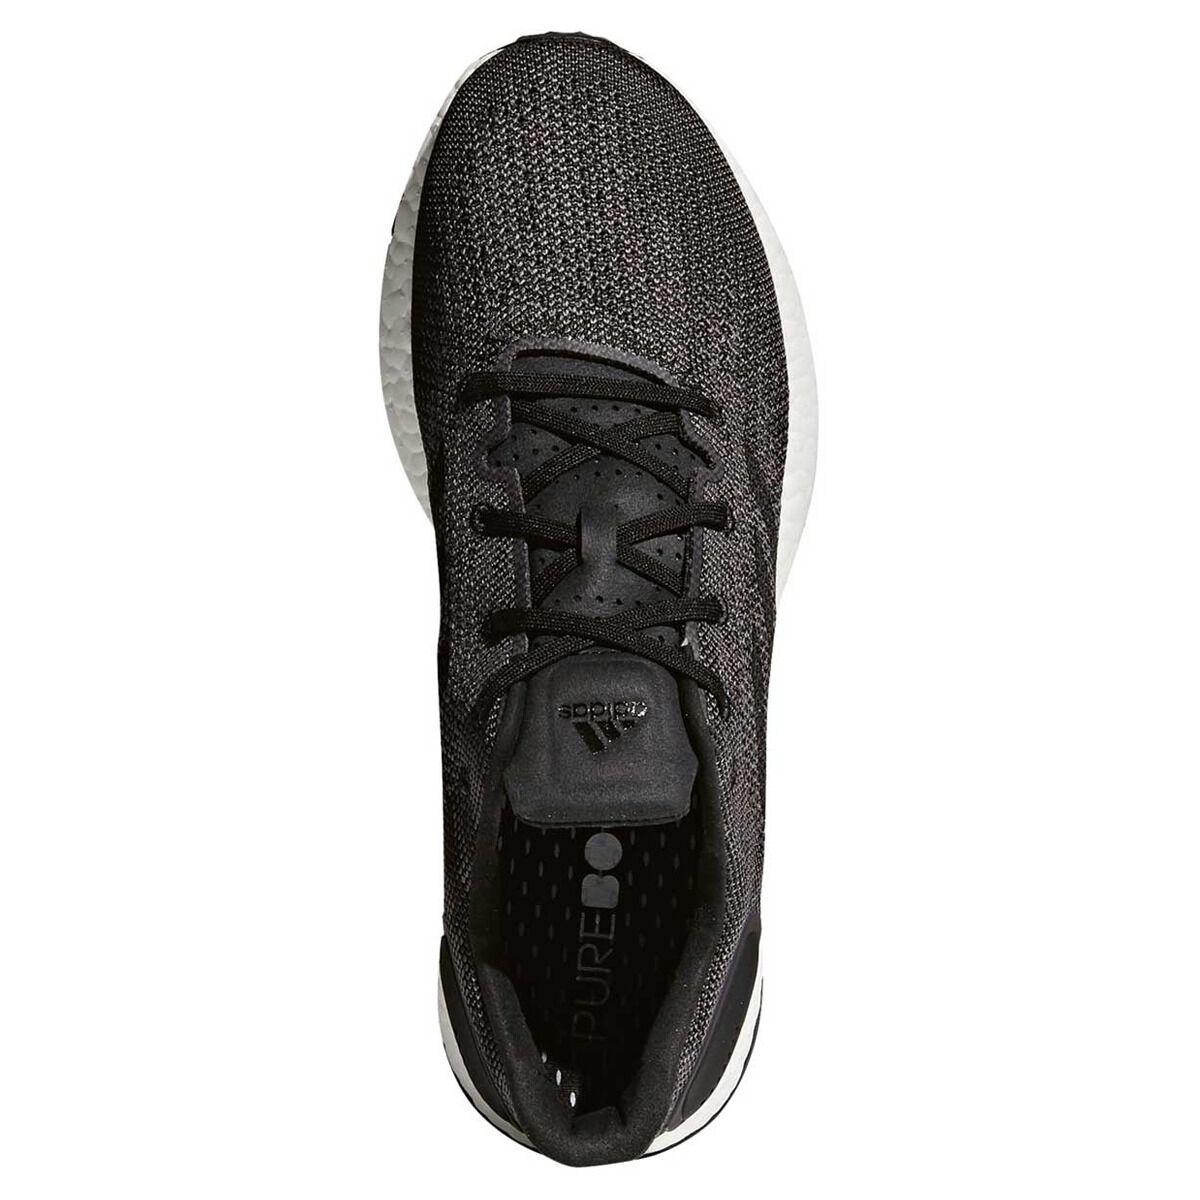 adidas Pureboost DPR Mens Running Shoes Black Grey US 10